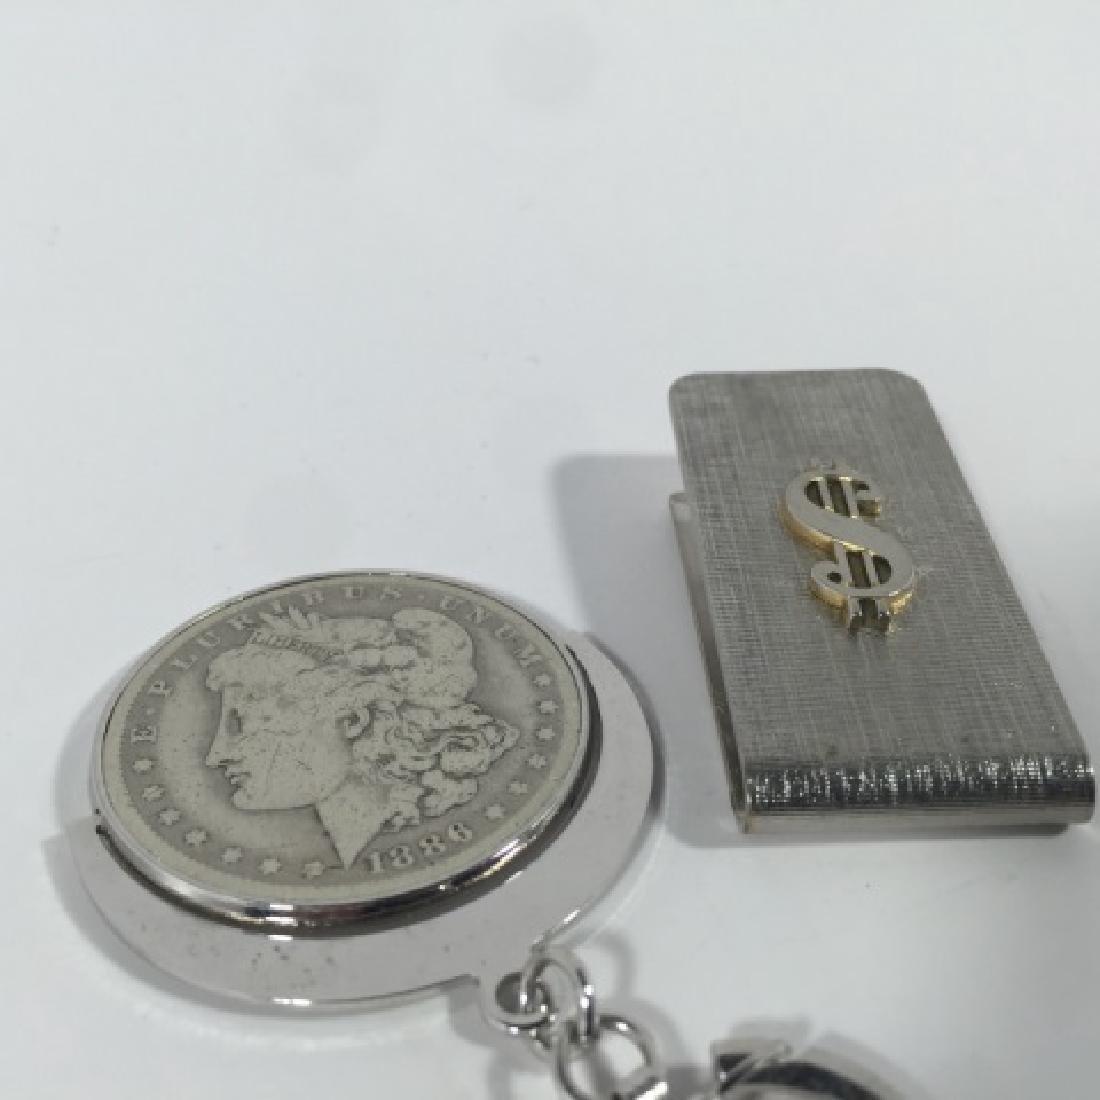 Antique 1886 US Dollar Key Chain & Money Clip - 3